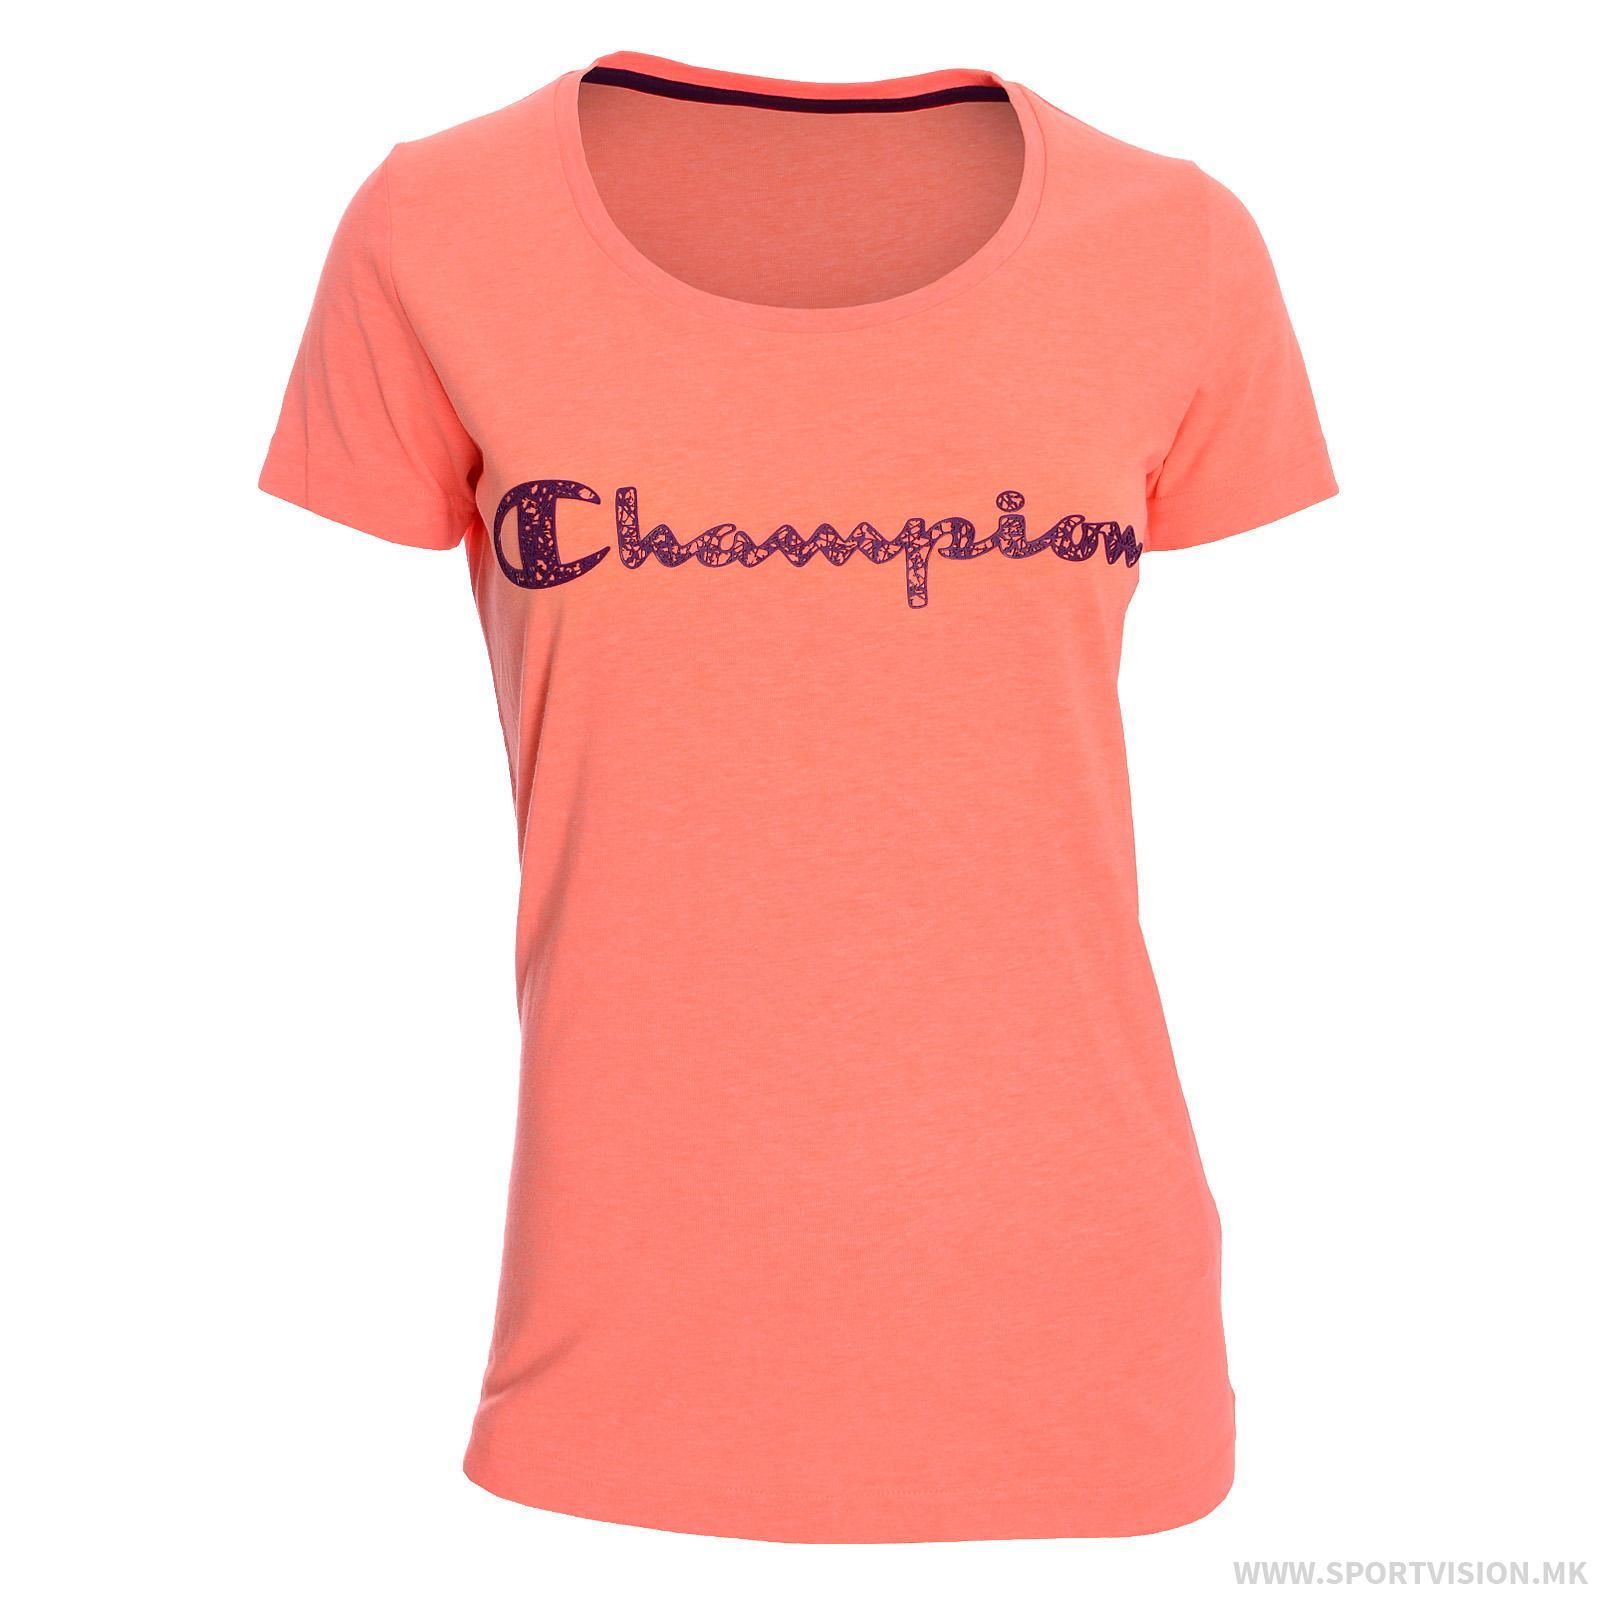 Print logo t shirt chz1171287 365 sport vision for Logo for t shirt printing